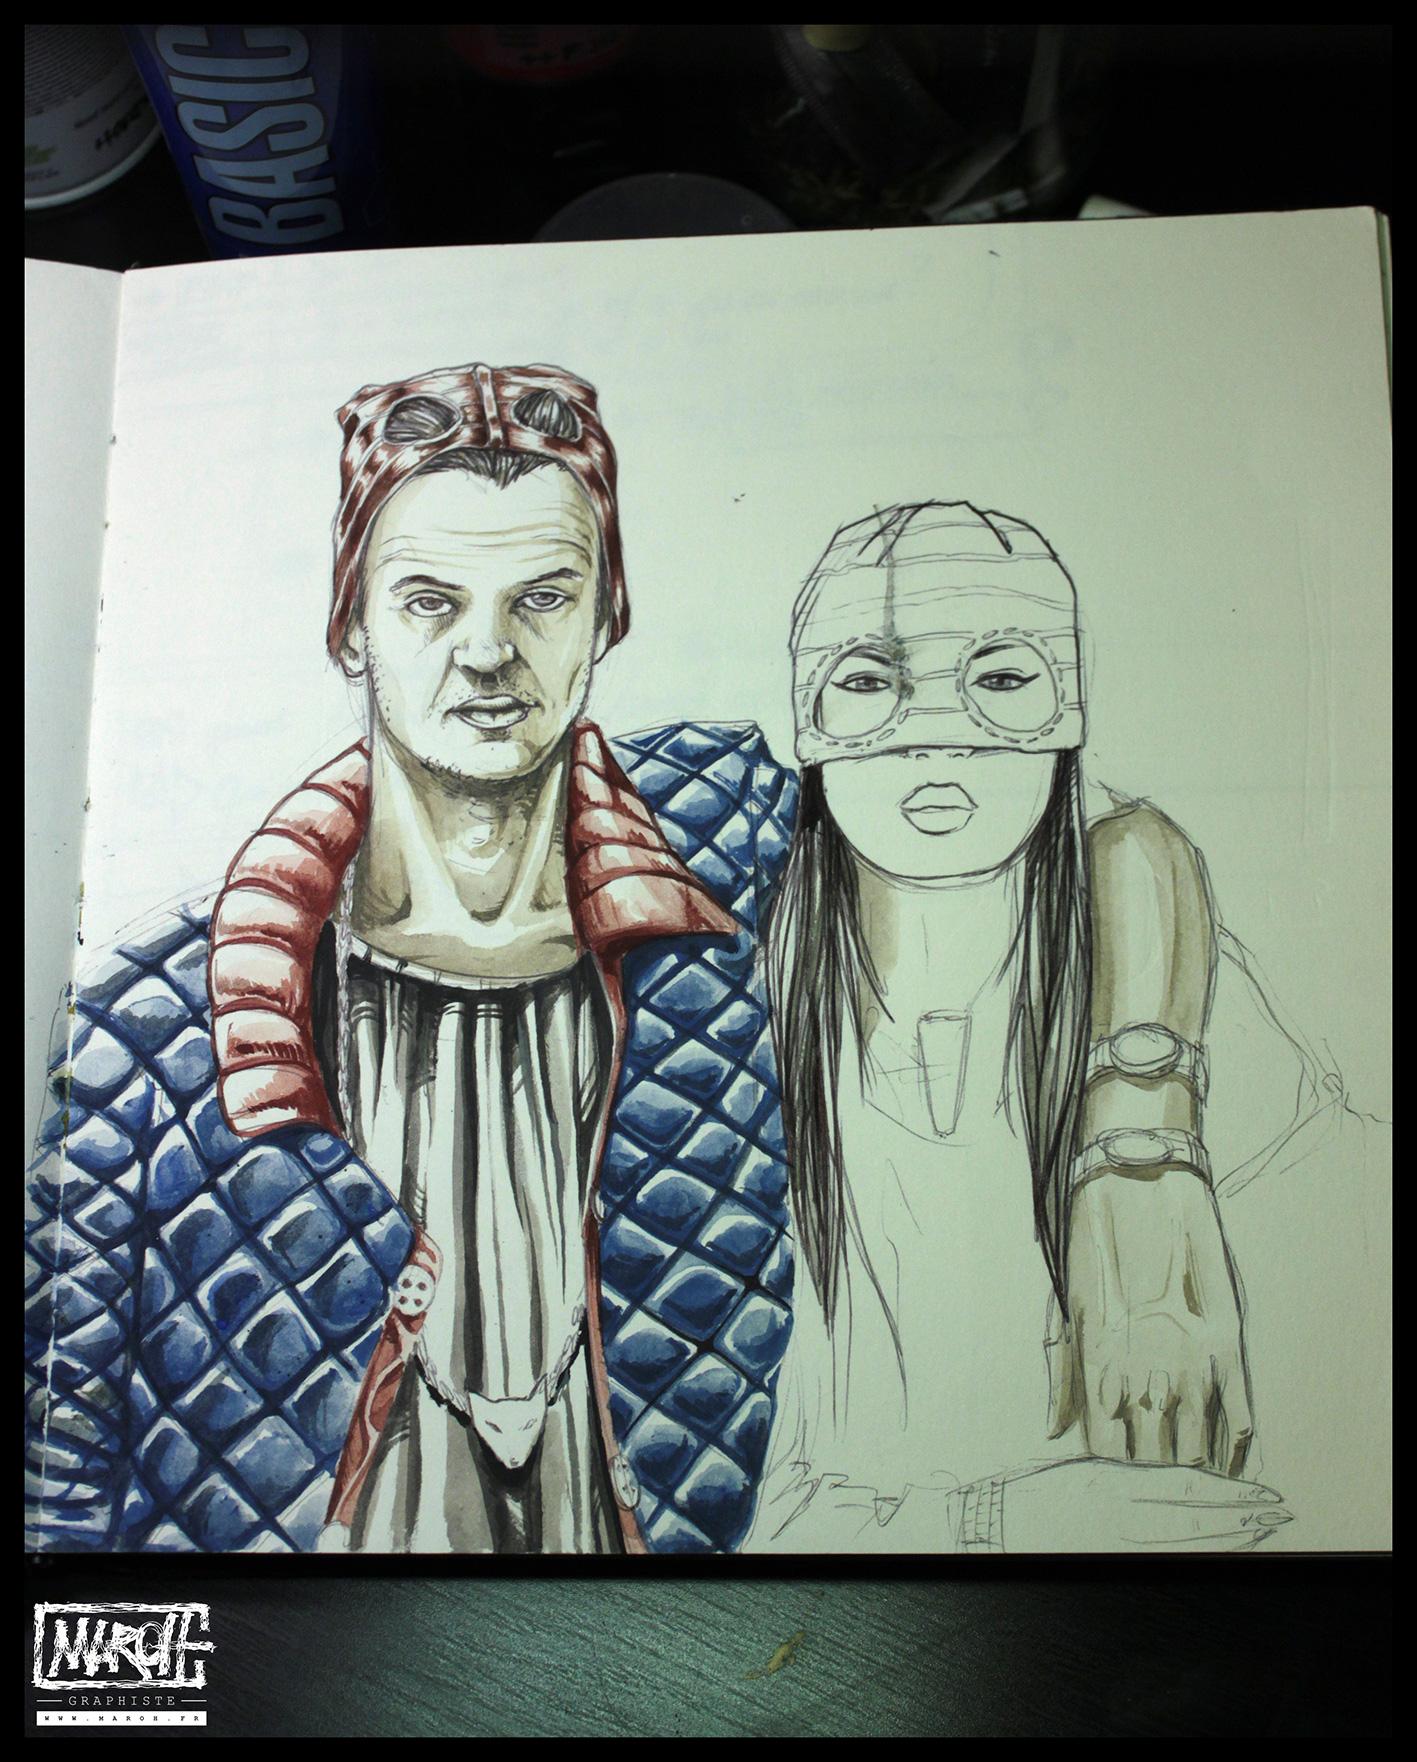 maroh---sketch-14